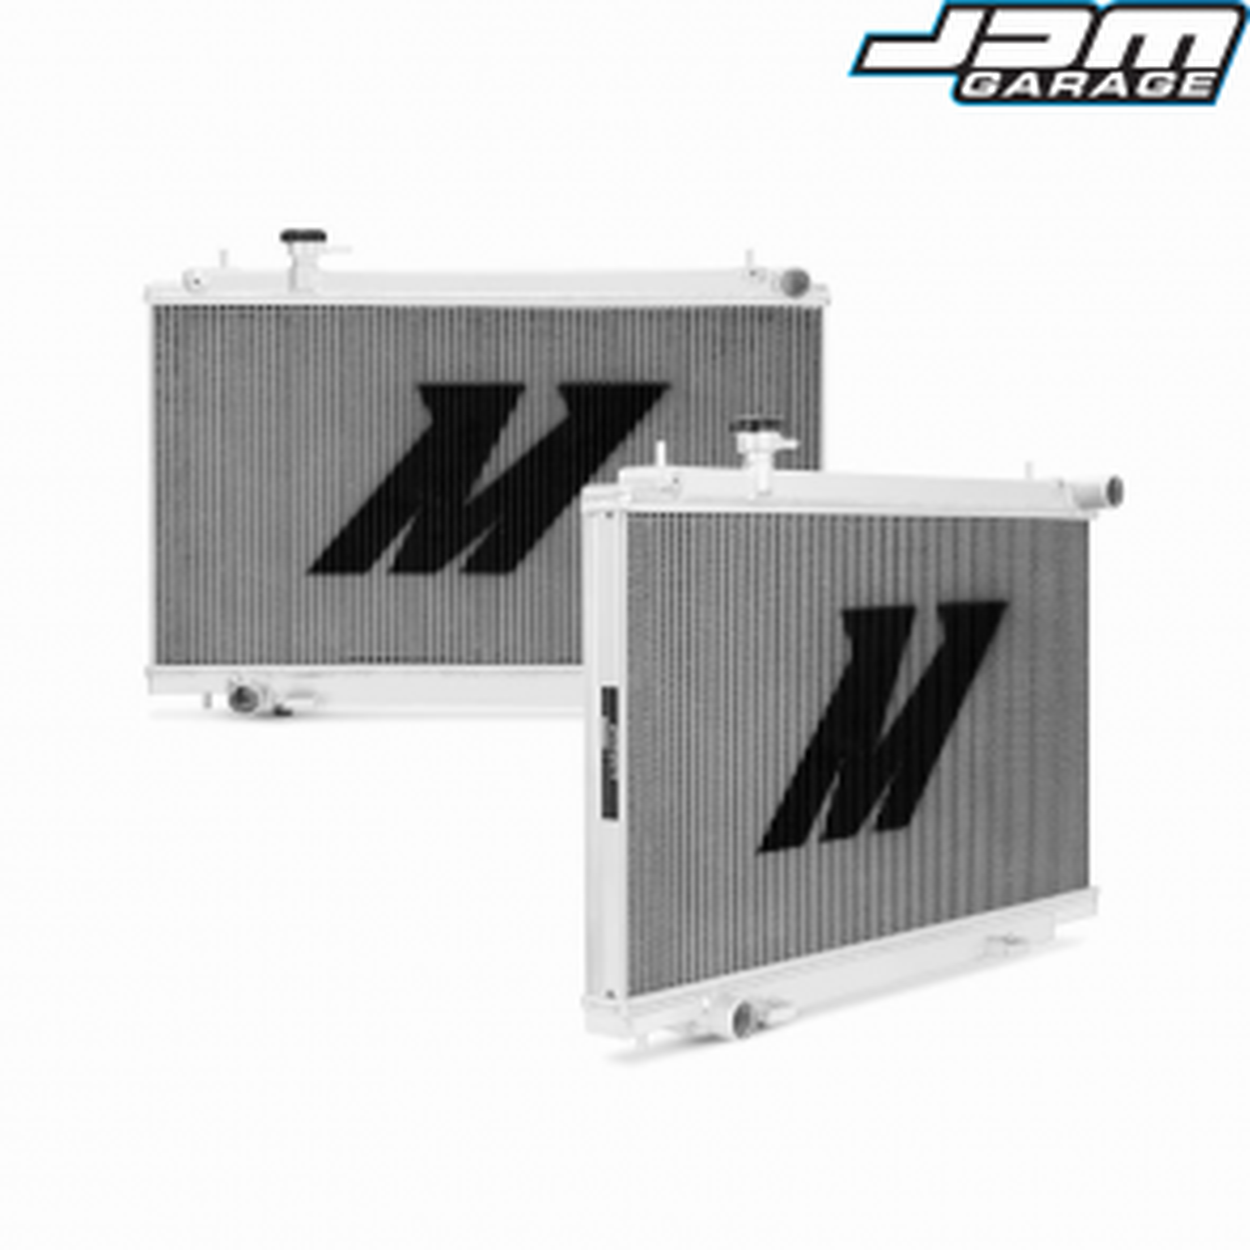 Mishimoto Performance Aluminium Radiators - Skyline R32 R33 R34 / R35 GTR / S13 S14 S15 / 350Z 370Z / 300ZX